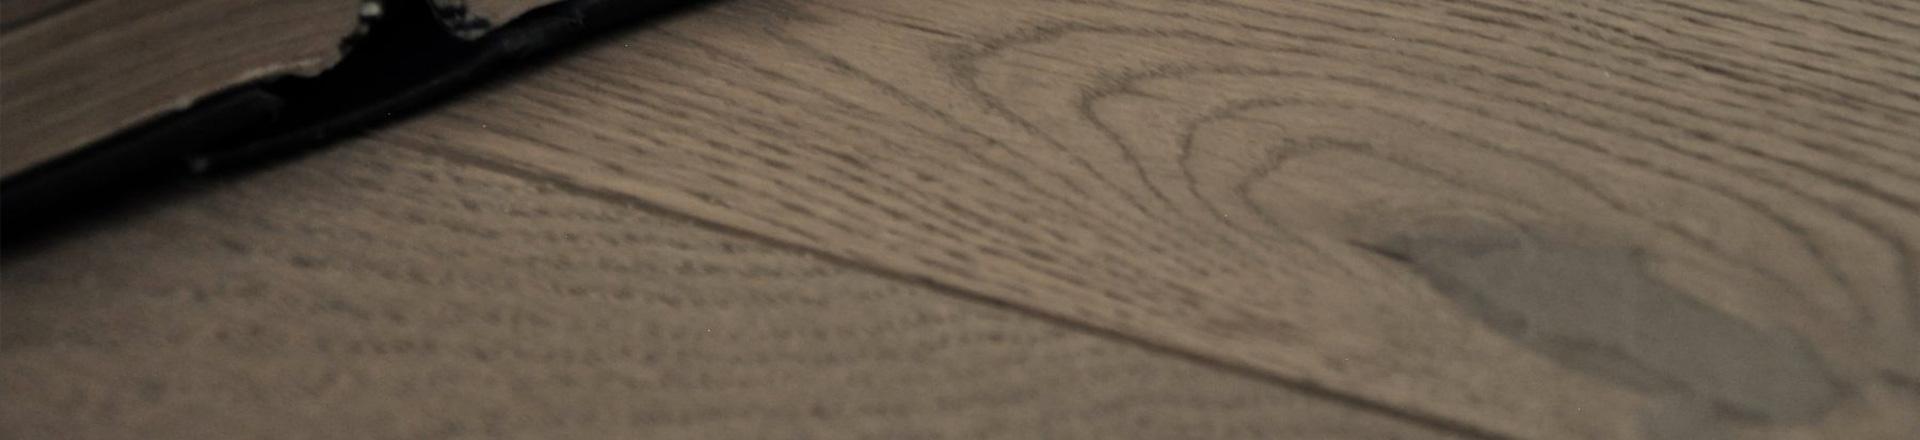 pavimento rovere sand nodoso